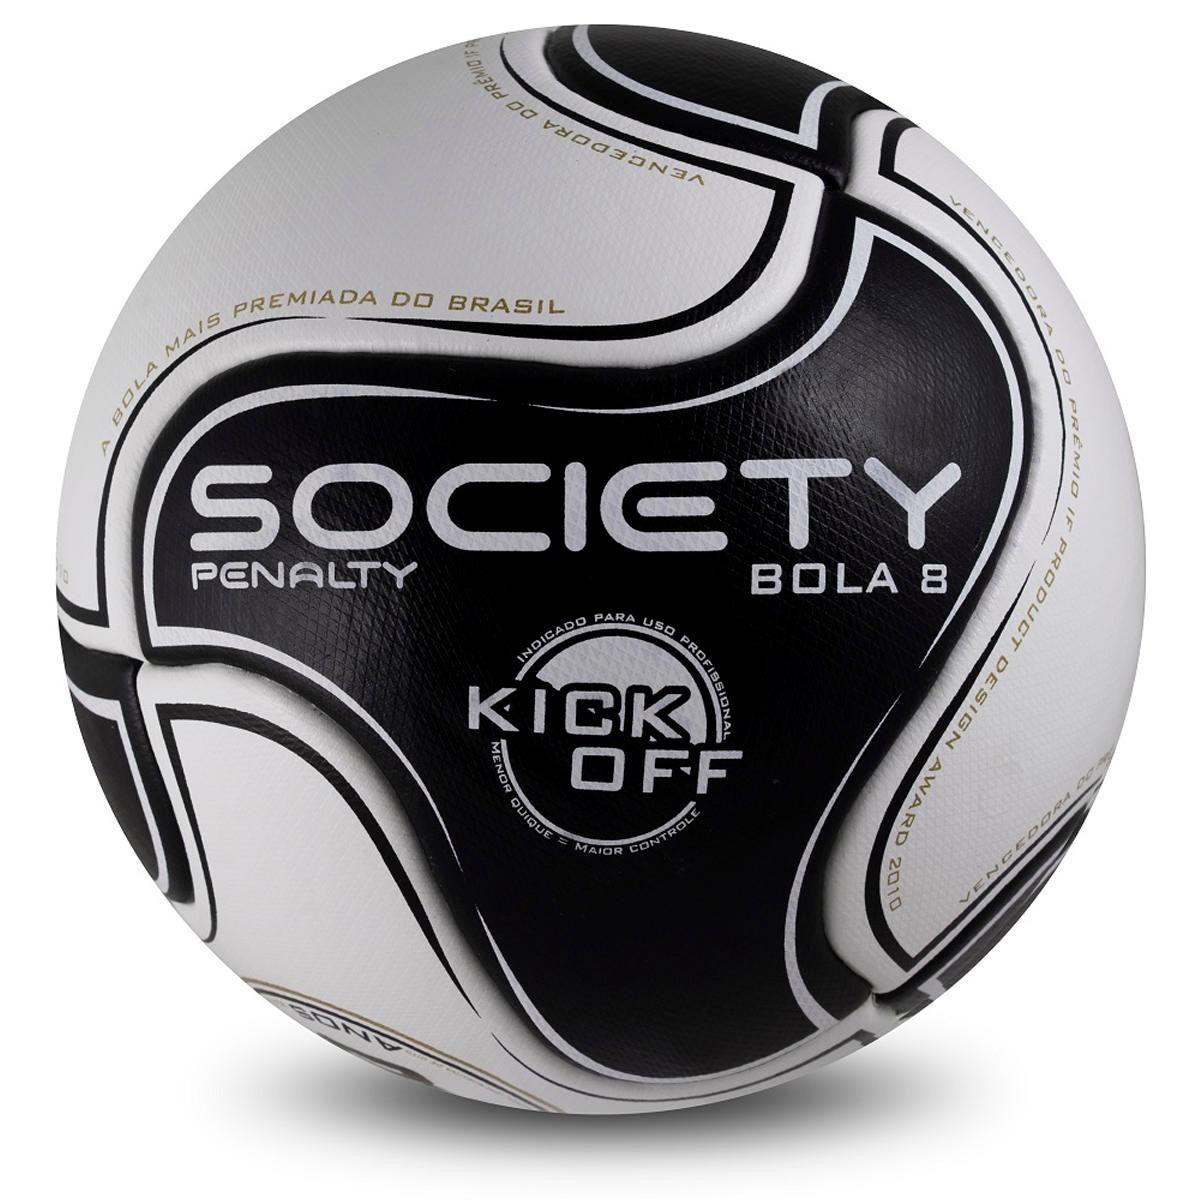 Bola De Futebol Society Kick Off 8 - Penalty - R  135 92bb569f2cdd8